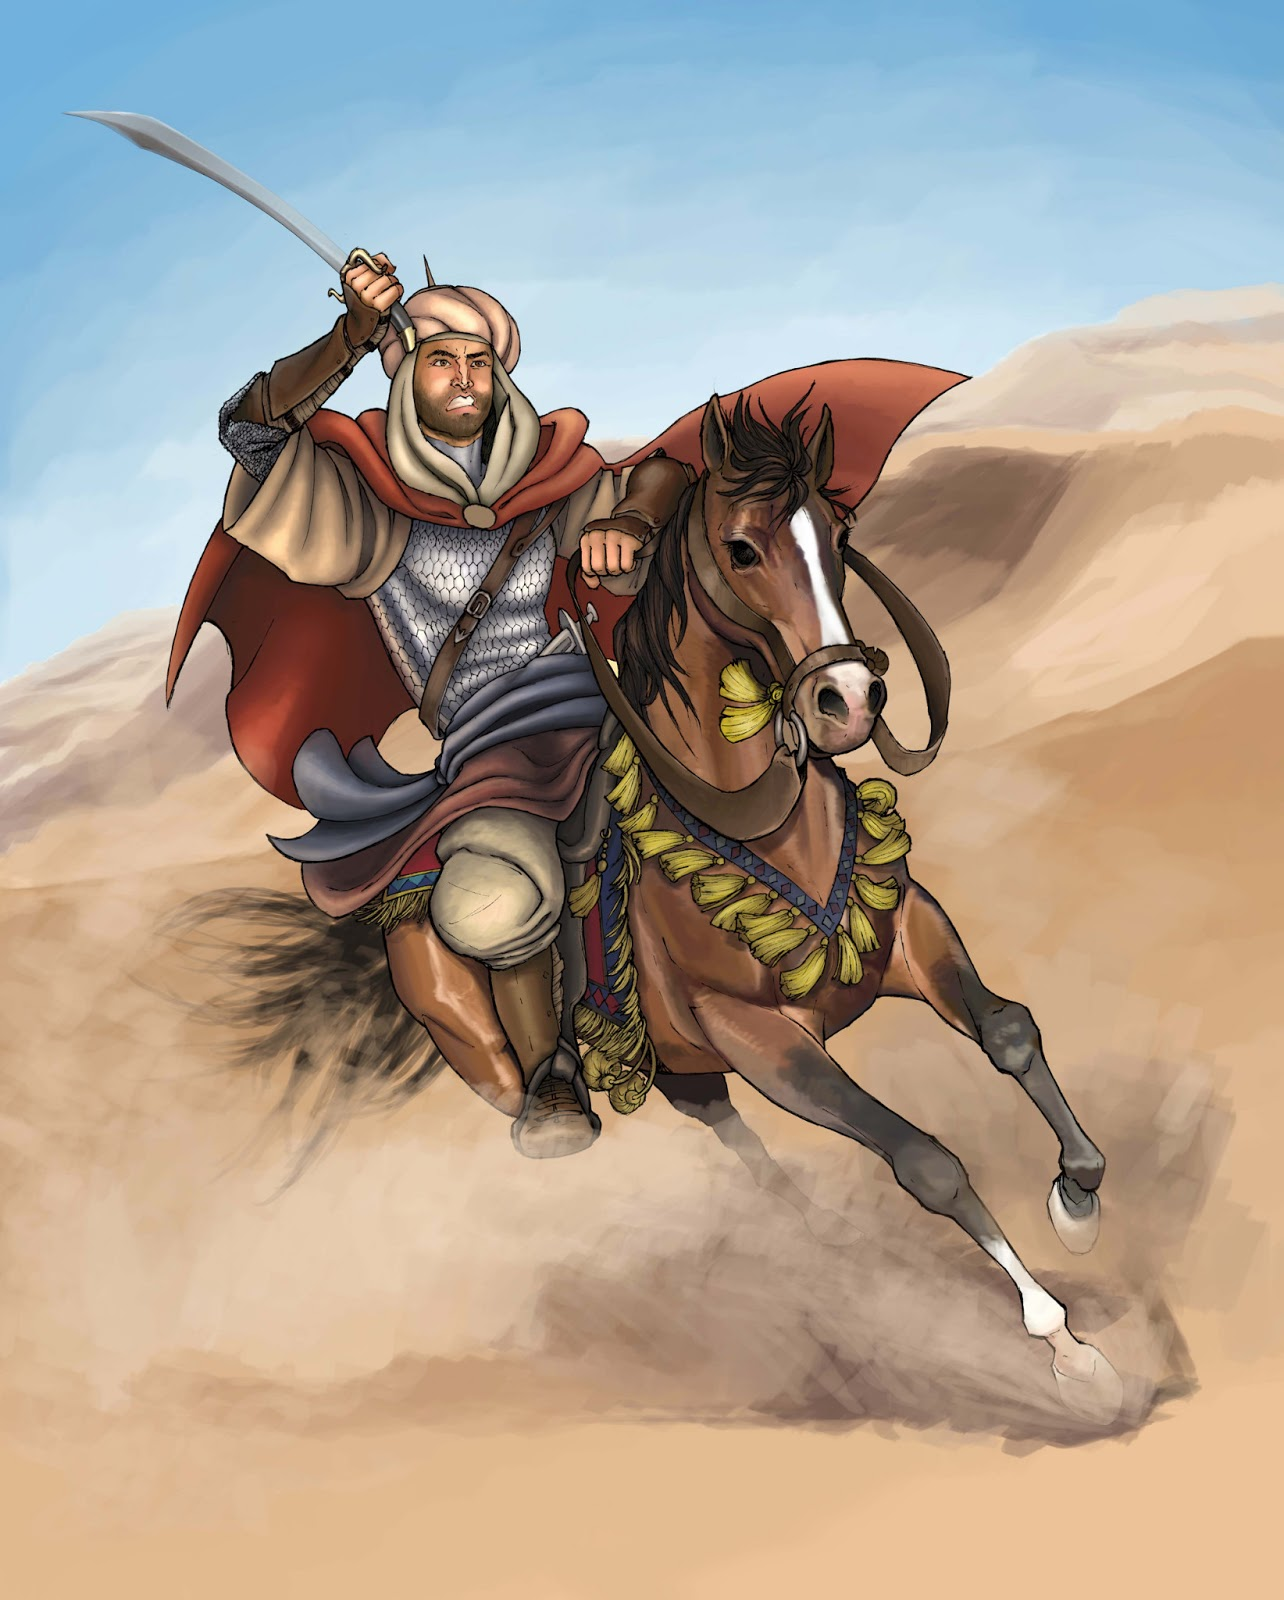 Pejuang Muslim Tentara Islam Muslim Warrior